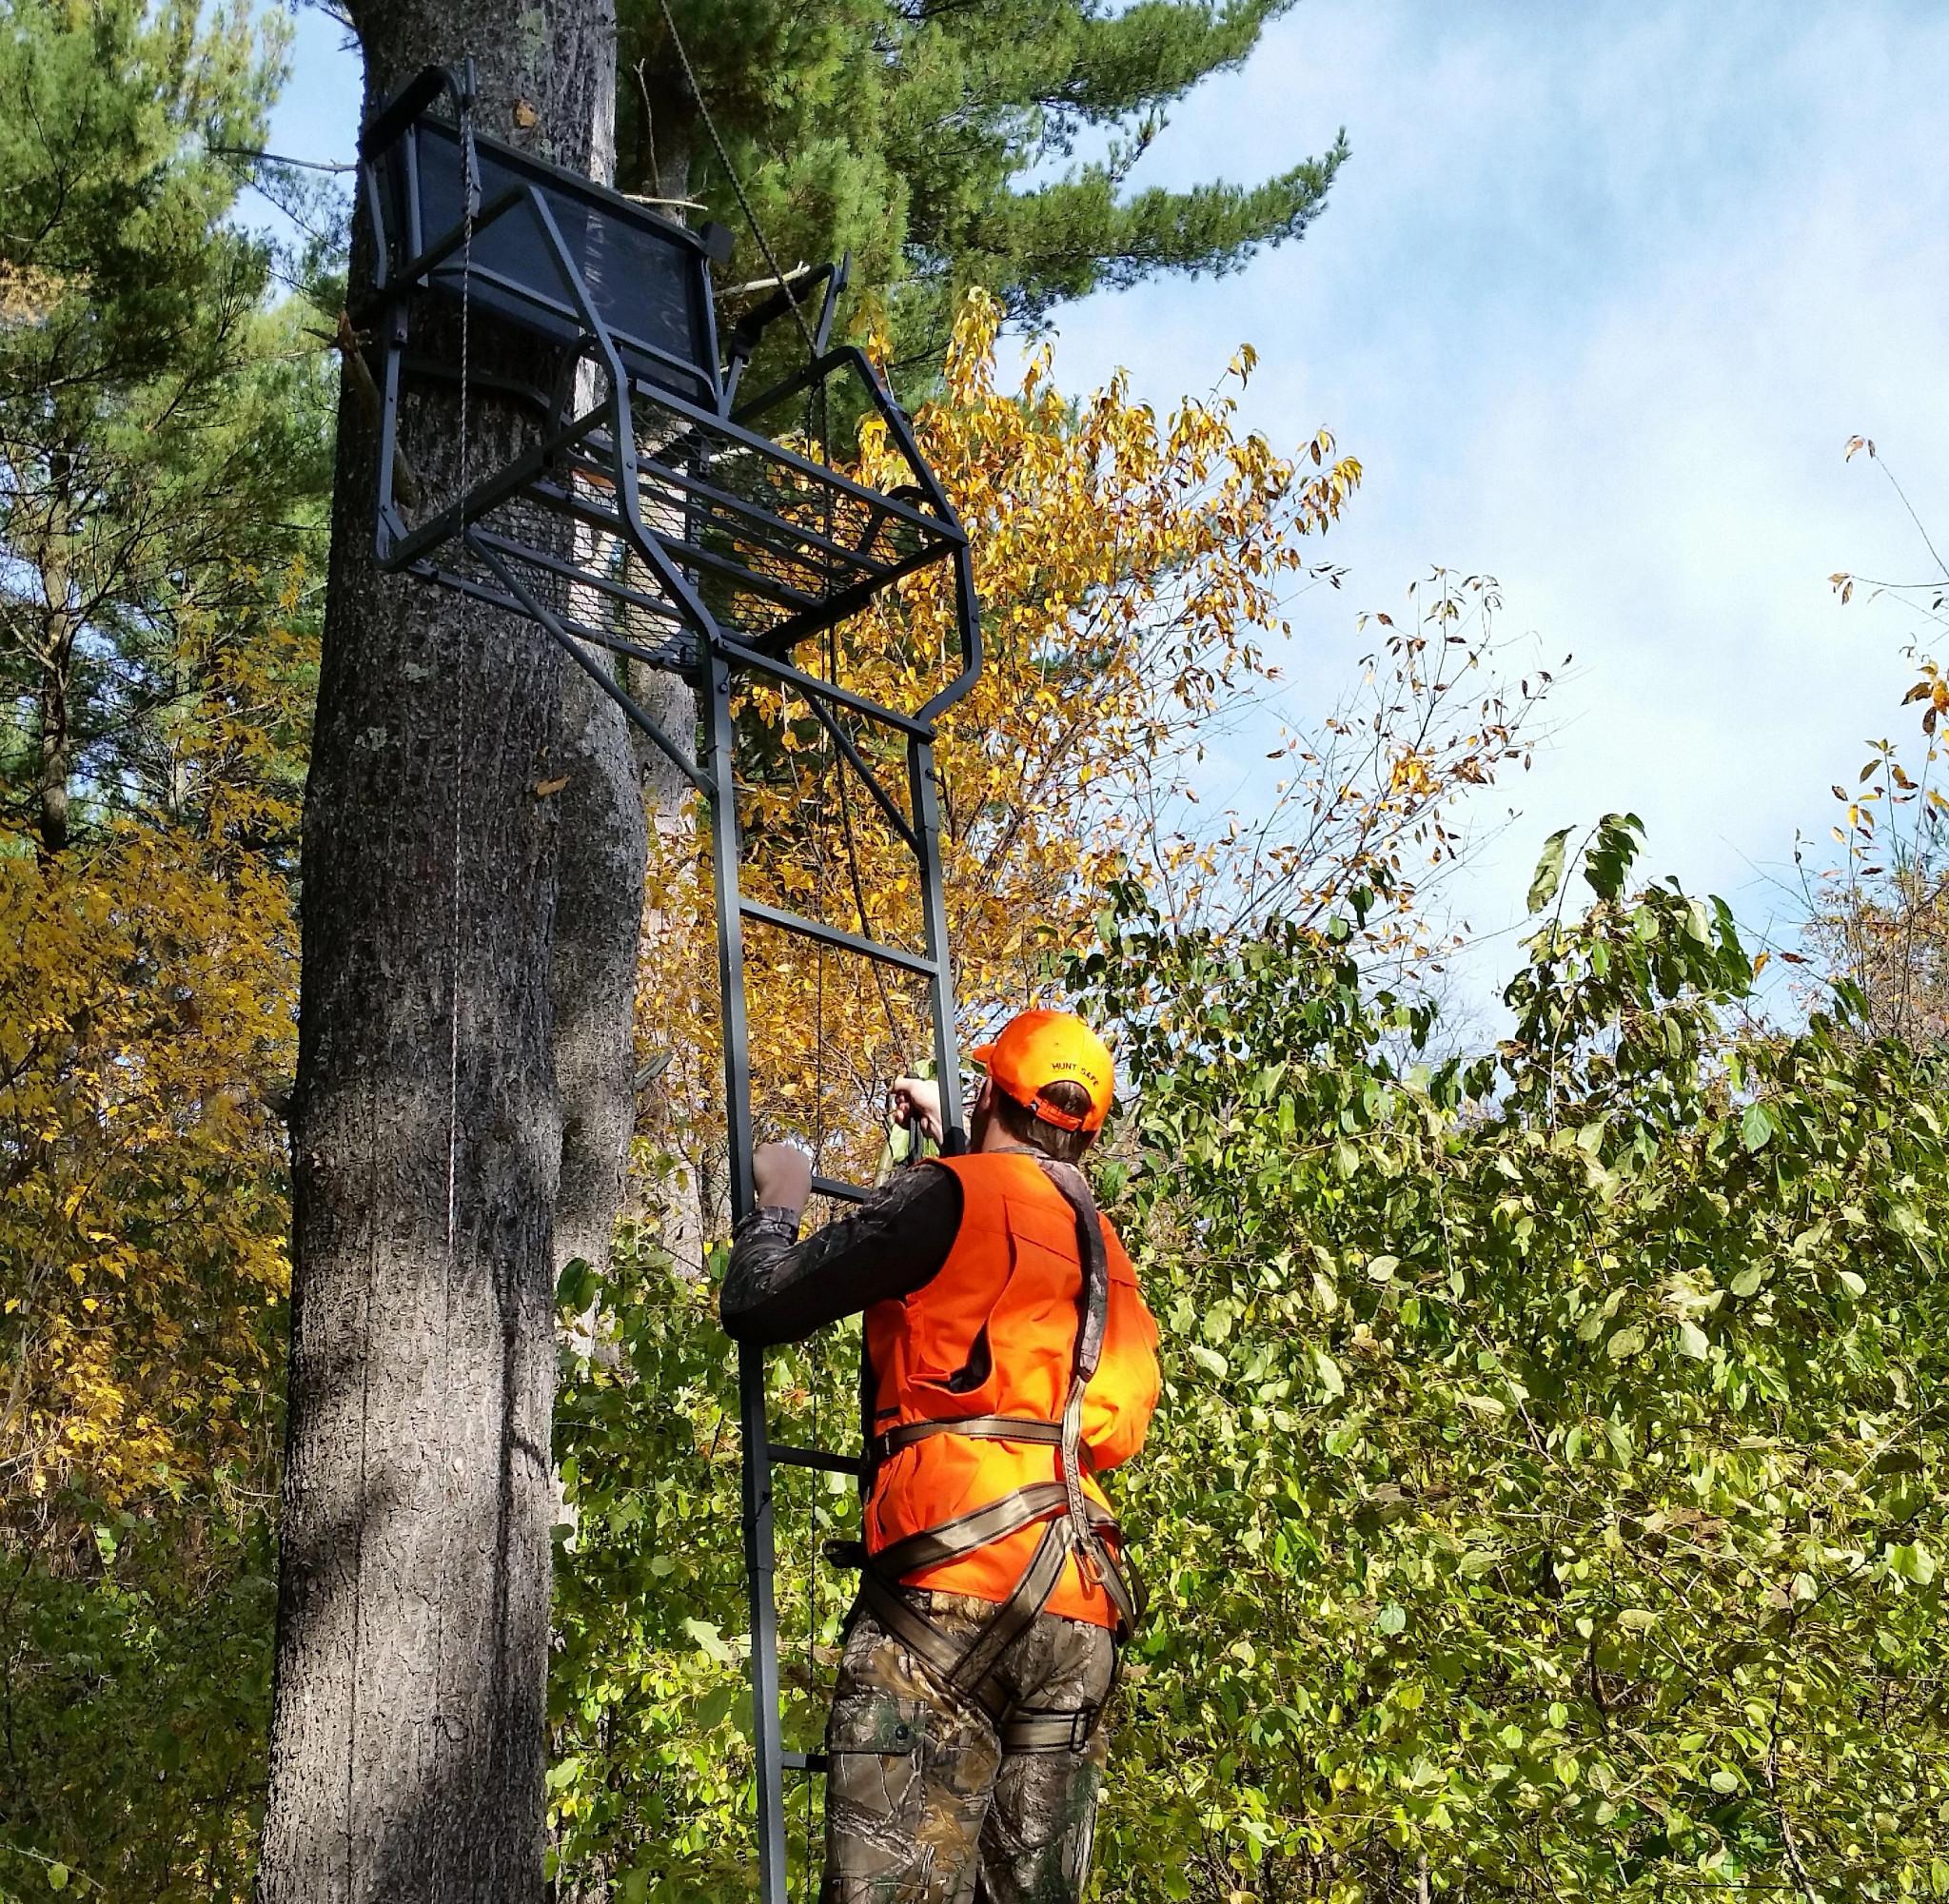 Hunter wearing a full-body harness climbs a treestand